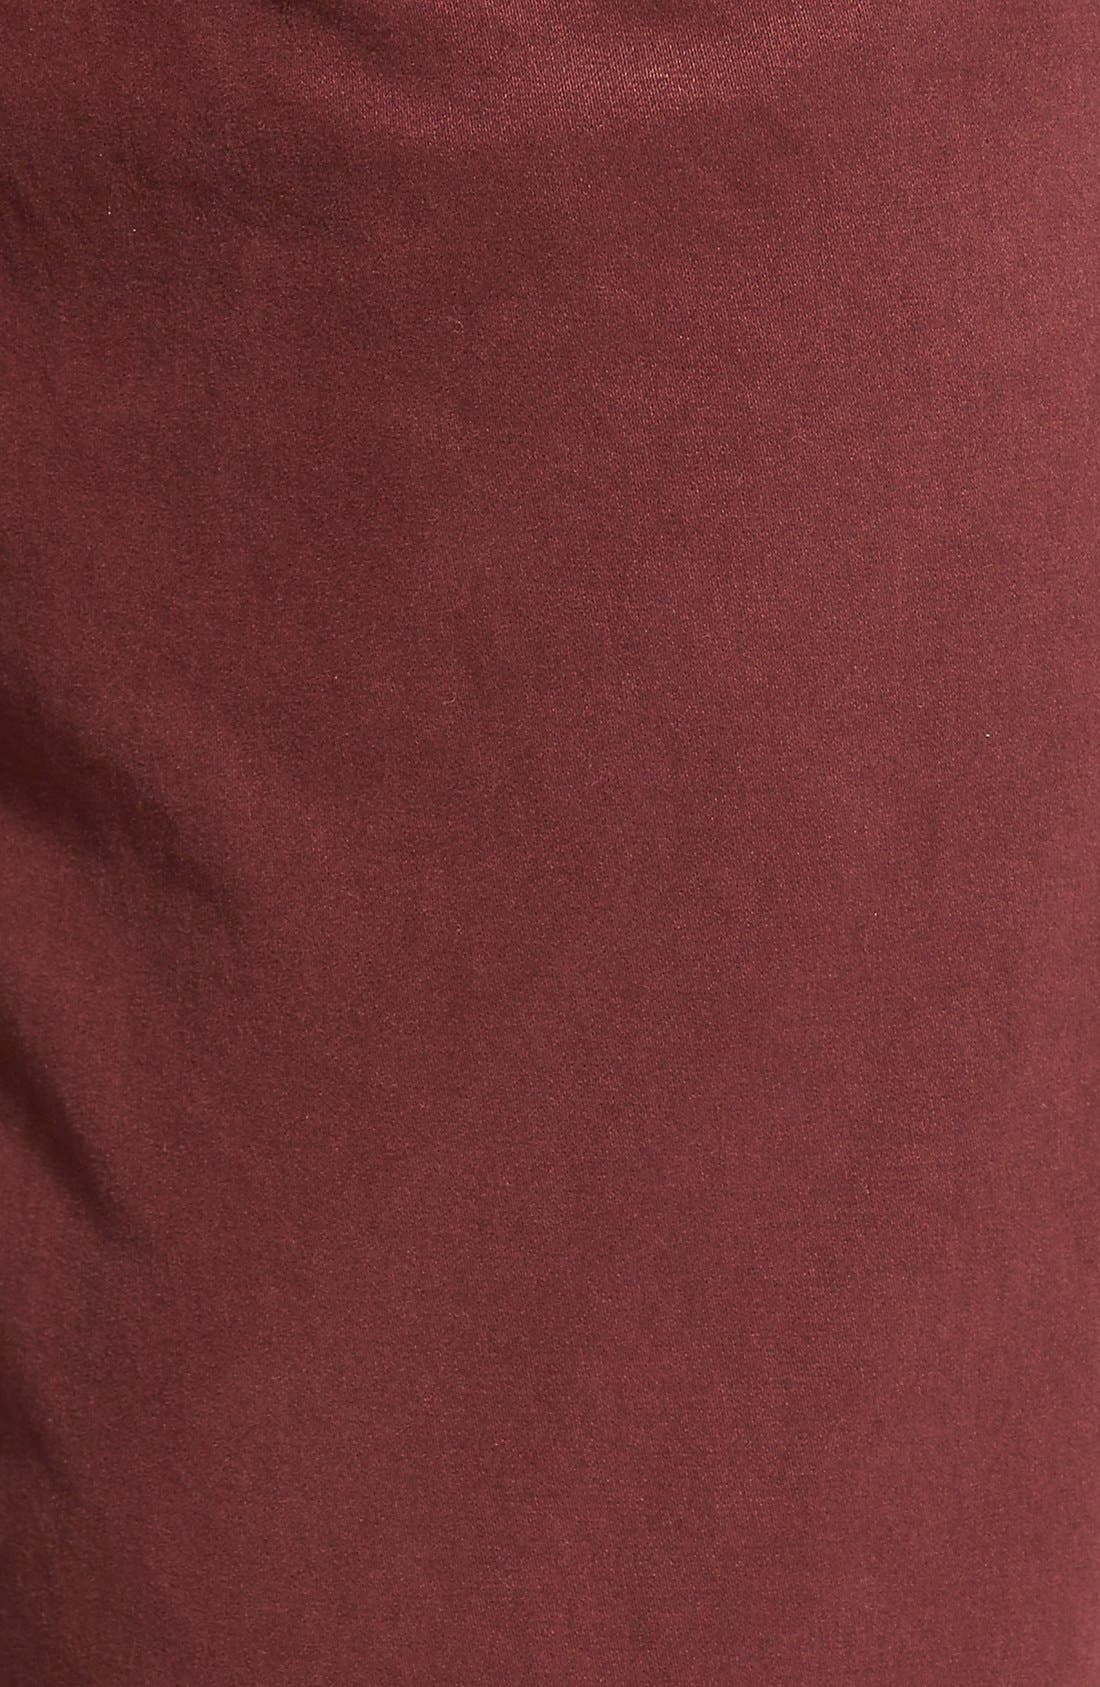 'Kane' Slim Fit Cotton Twill Pants,                             Alternate thumbnail 80, color,